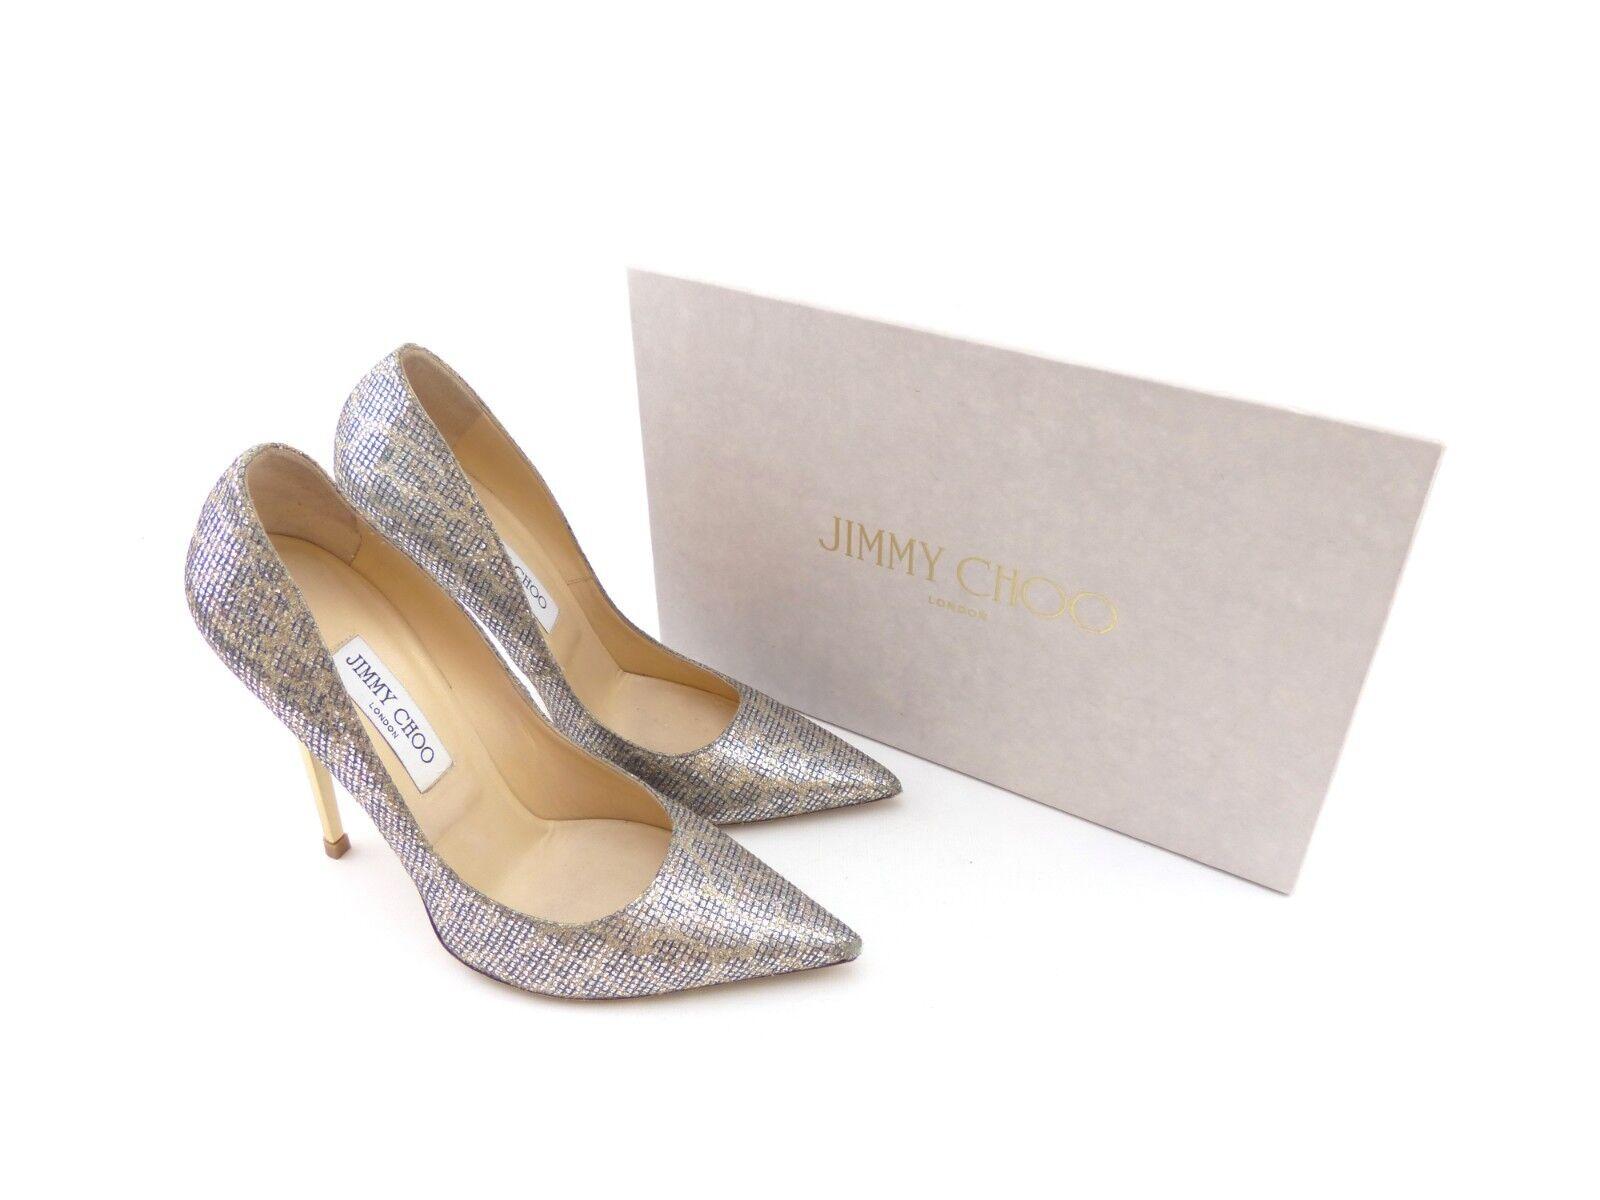 Jimmy CHOO ANOUK CHAMPAGNE Leopardato tessuto glitter [47% RRP] RRP] RRP] | Fashionable  91ff89